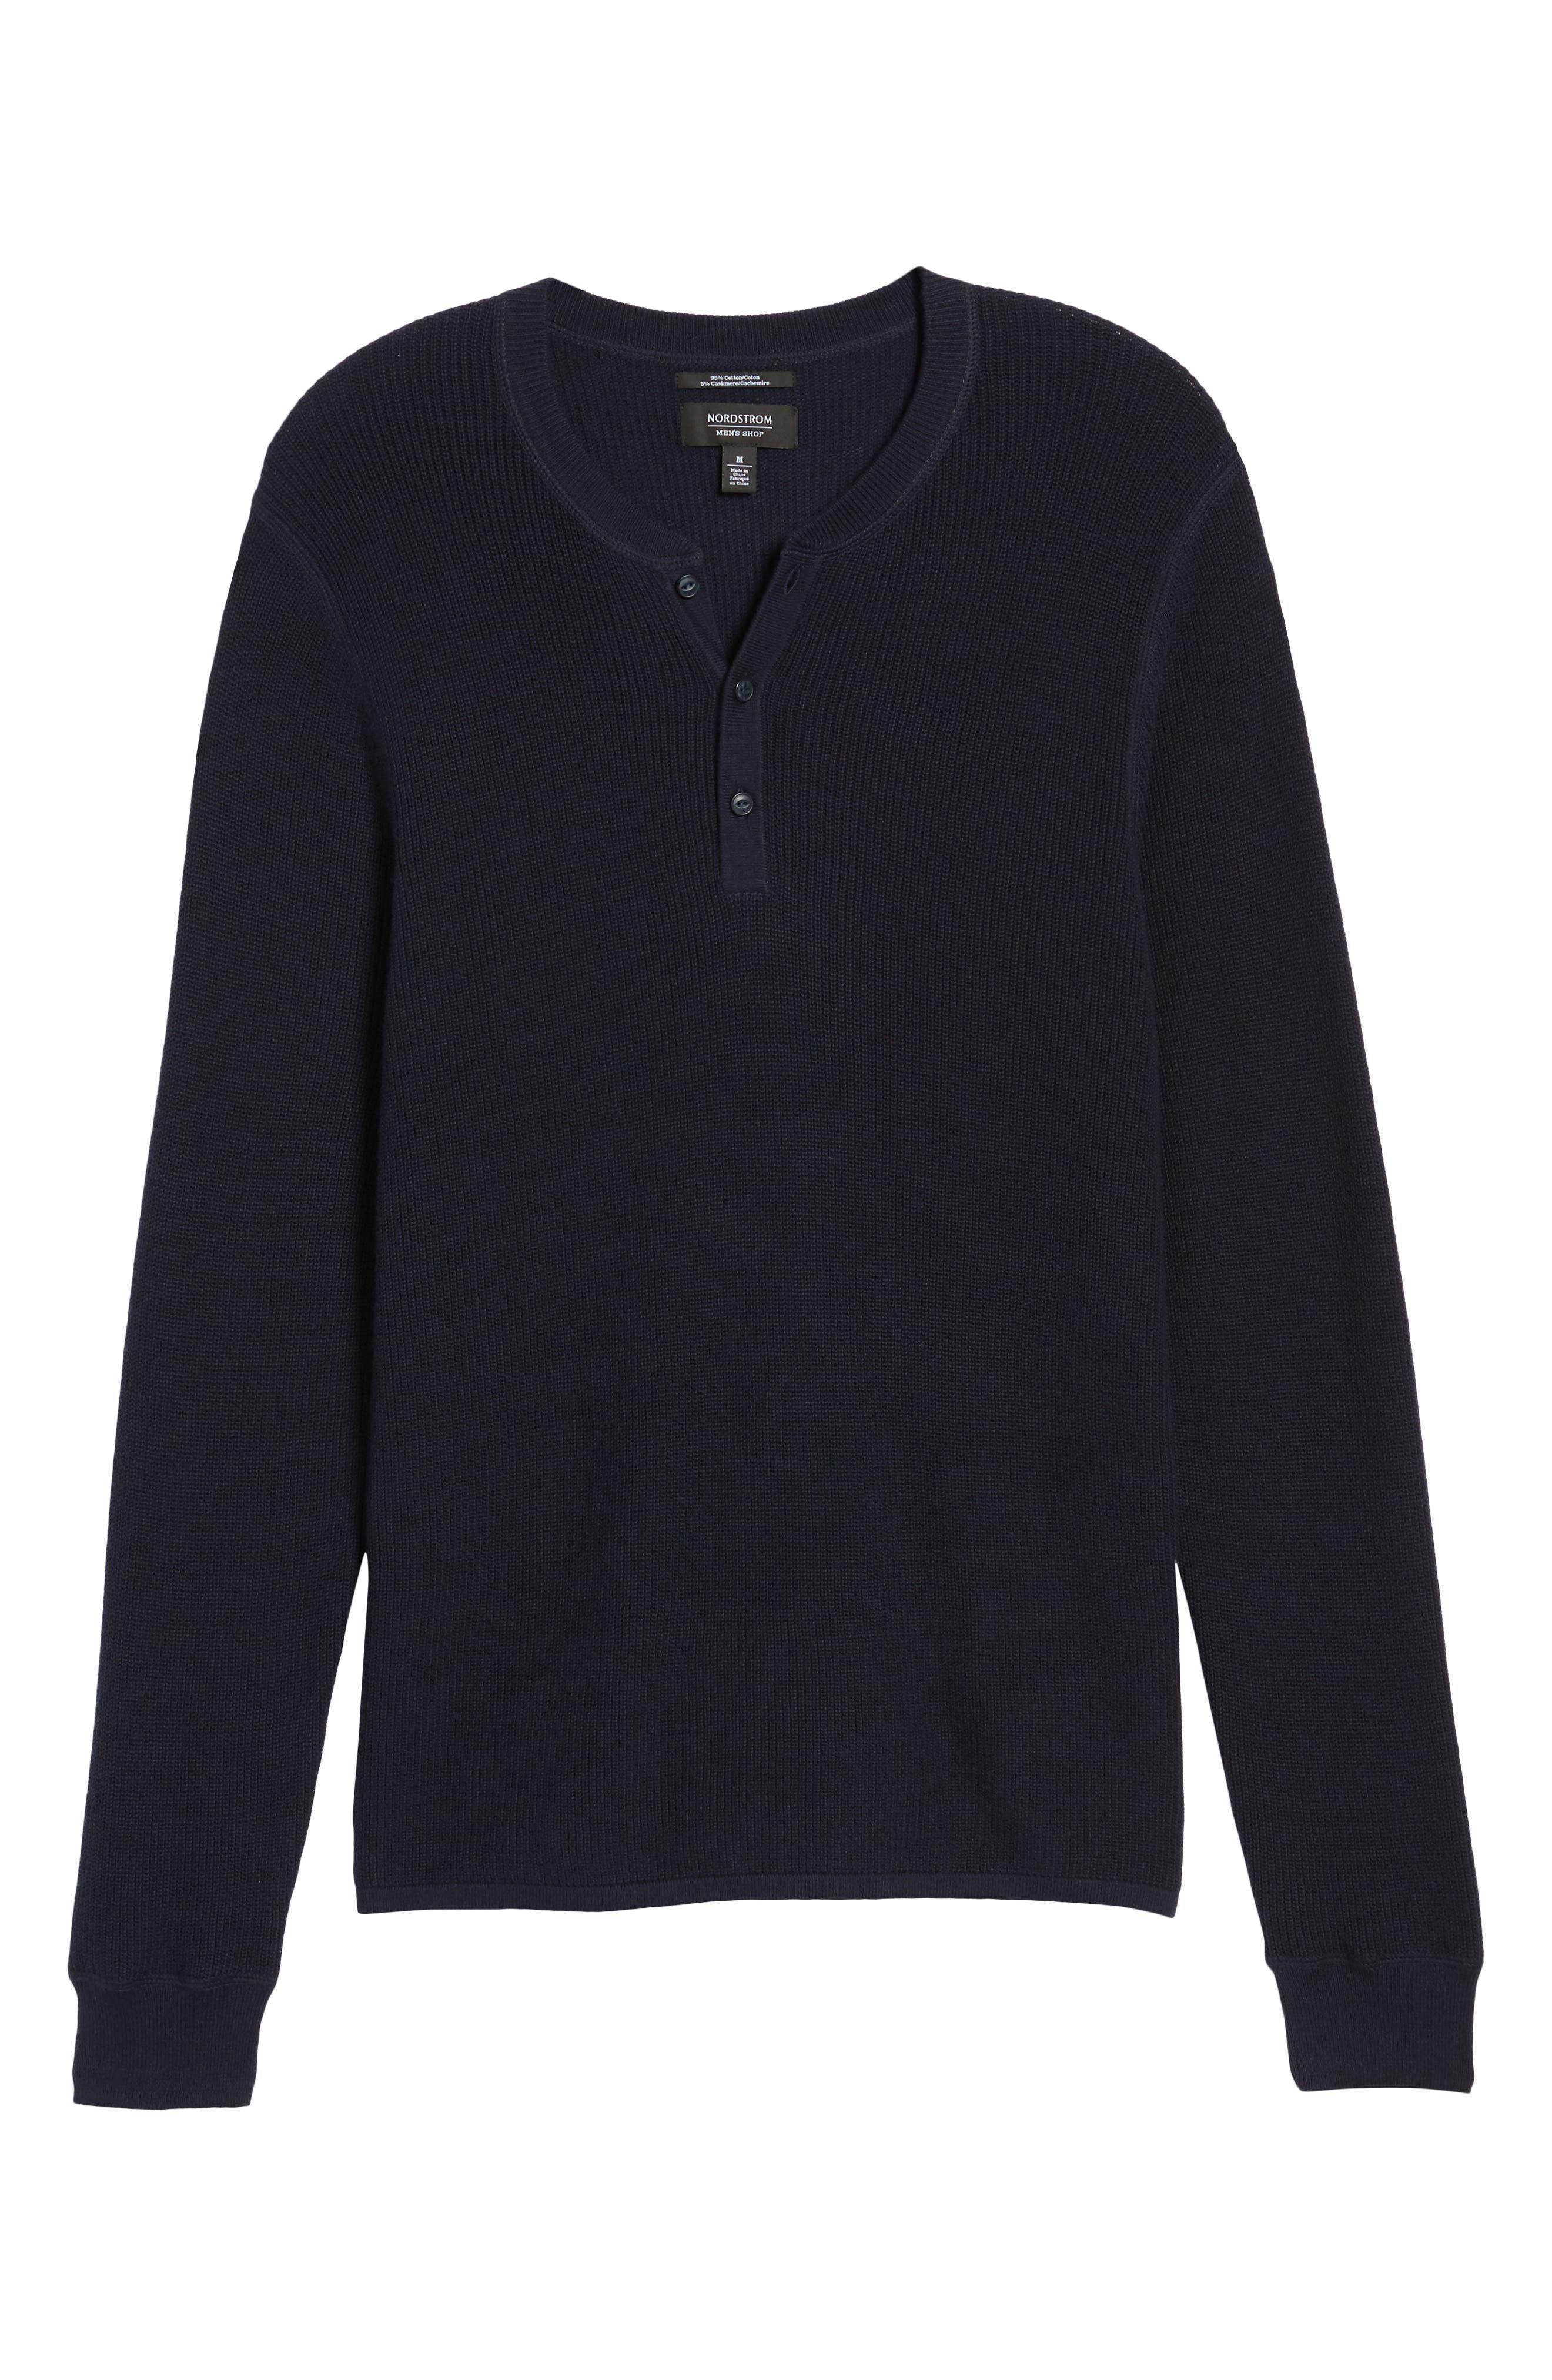 Cotton & Cashmere Henley Sweater,                             Alternate thumbnail 17, color,